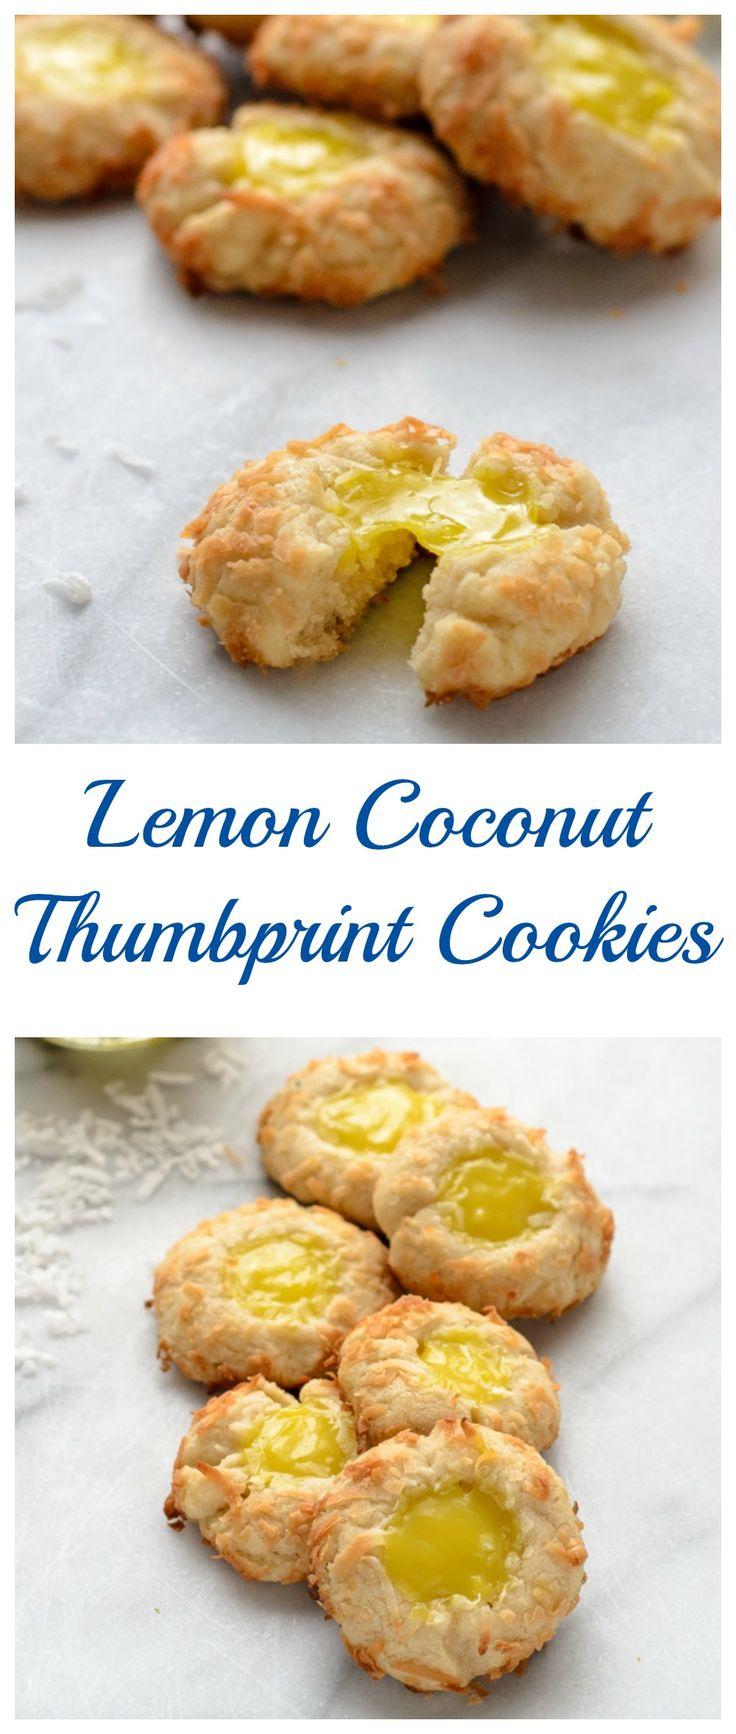 Buttery Lemon Coconut Thumbprint Cookies. (lightly crispy, buttery shortbread )